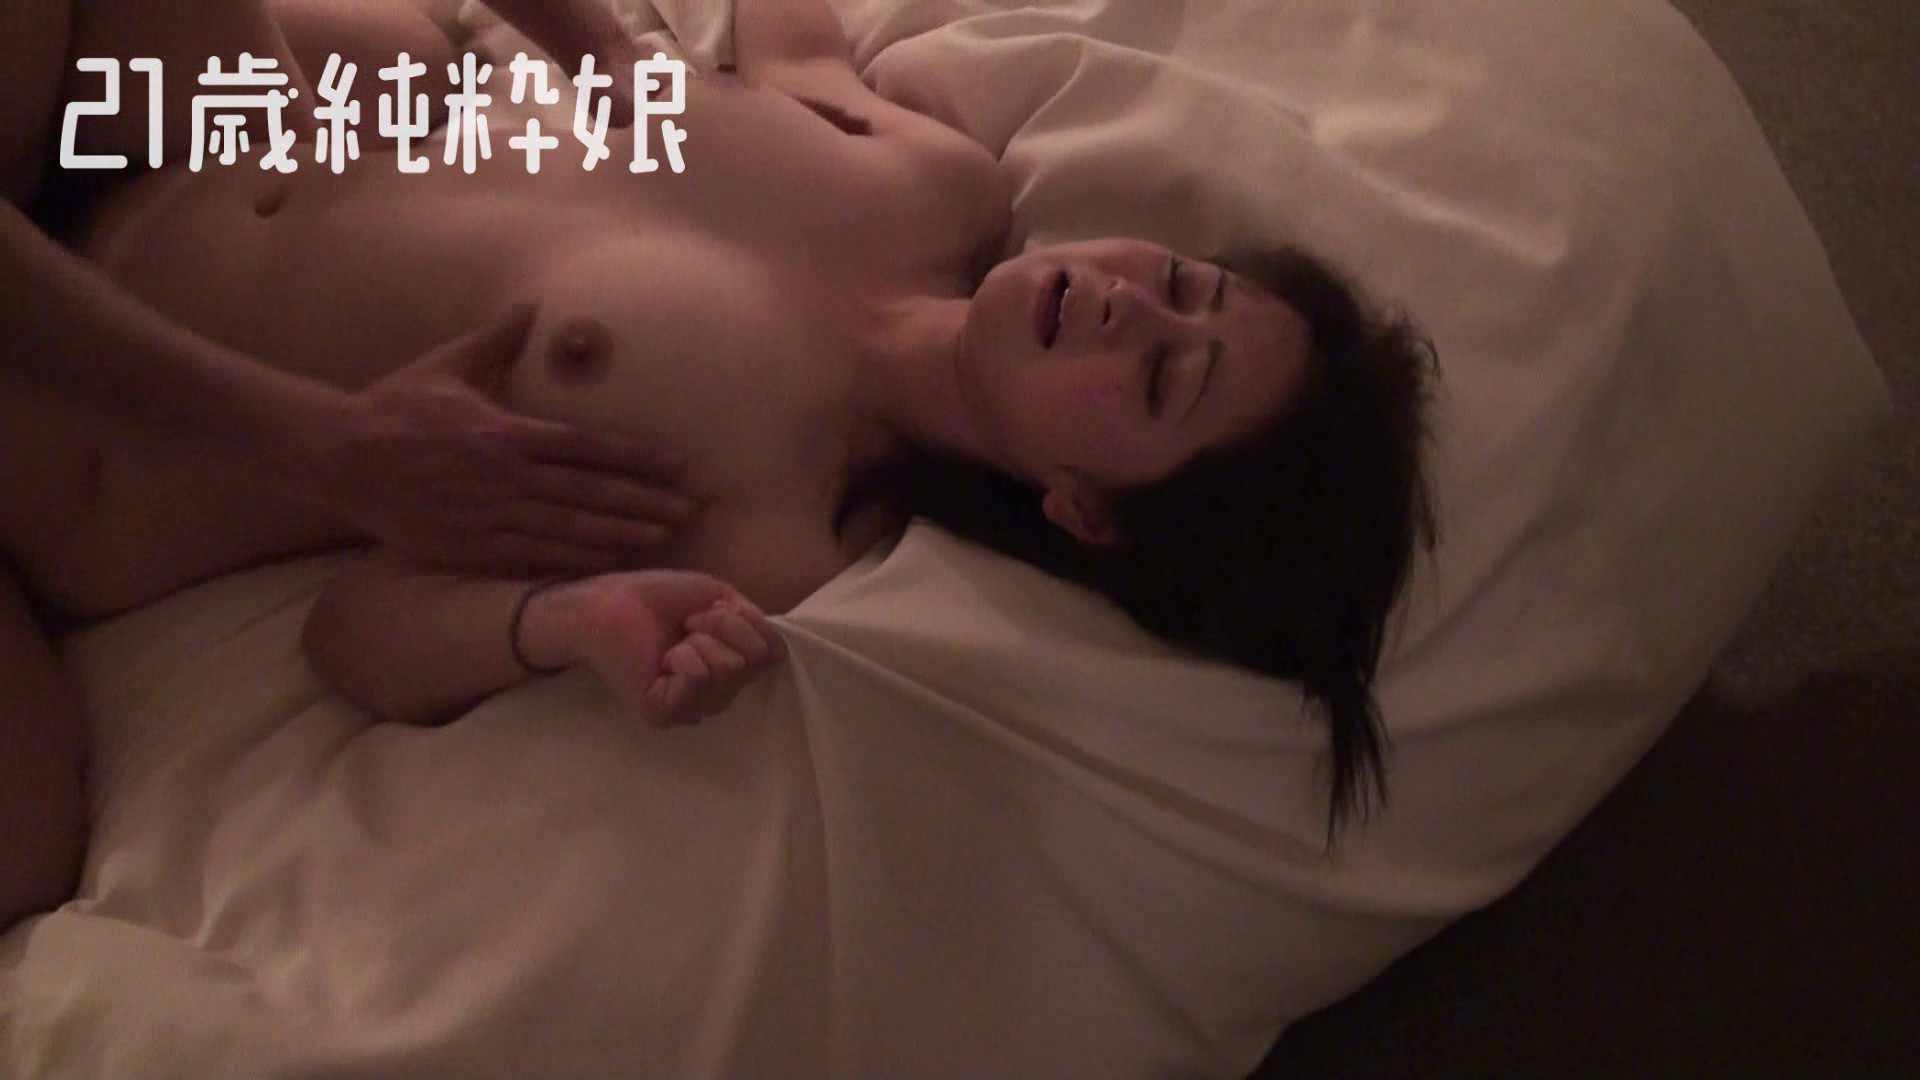 Gカップ21歳純粋嬢第2弾Vol.4 一般投稿 おまんこ無修正動画無料 69枚 62